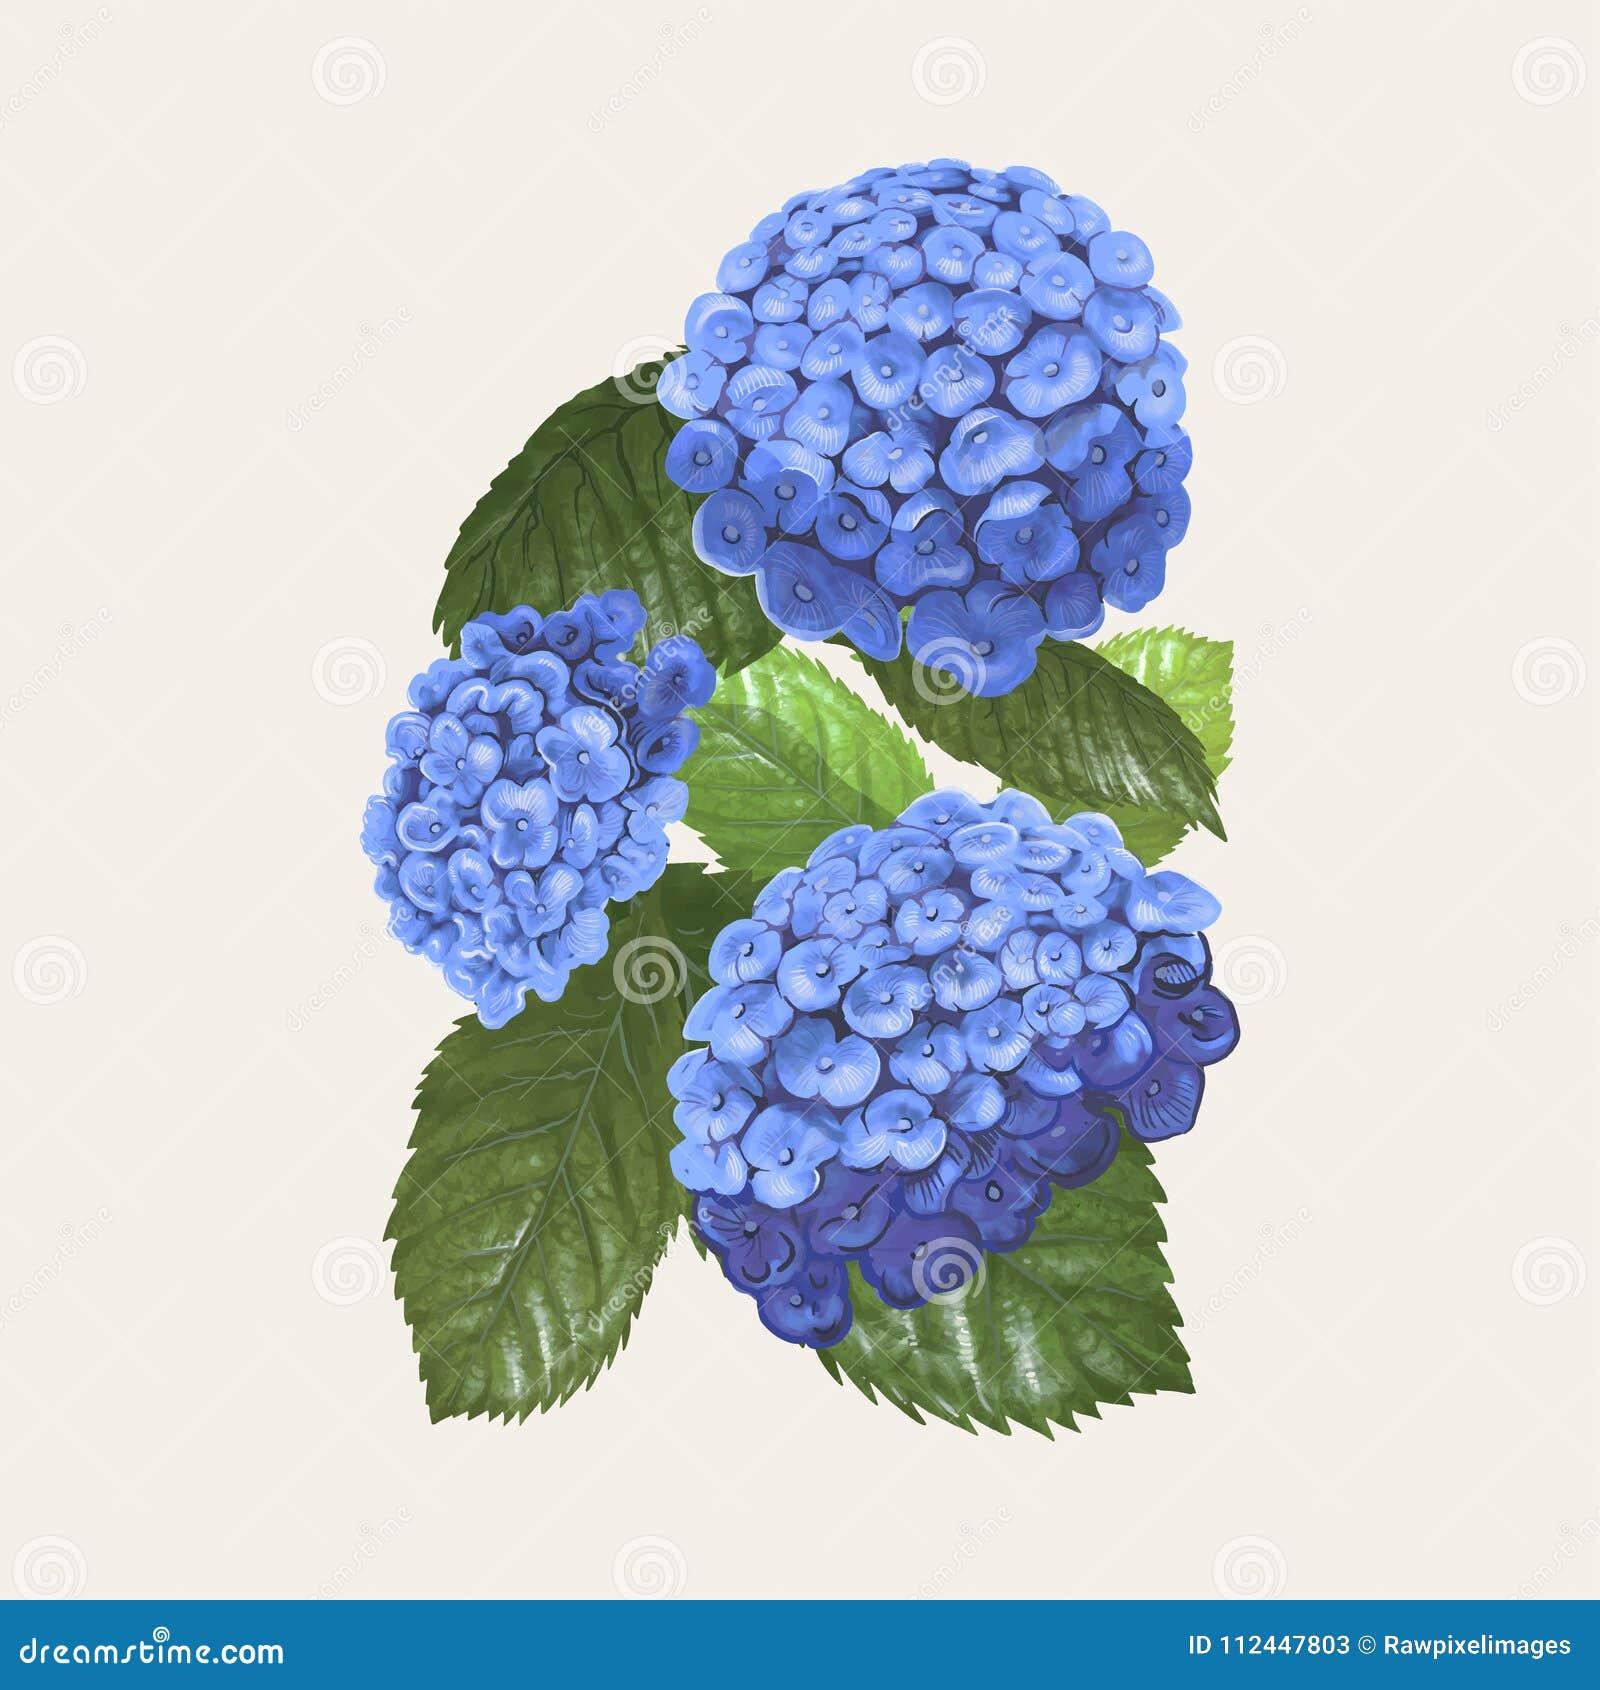 Dessin D Illustration Des Fleurs D Hortensia Illustration Stock